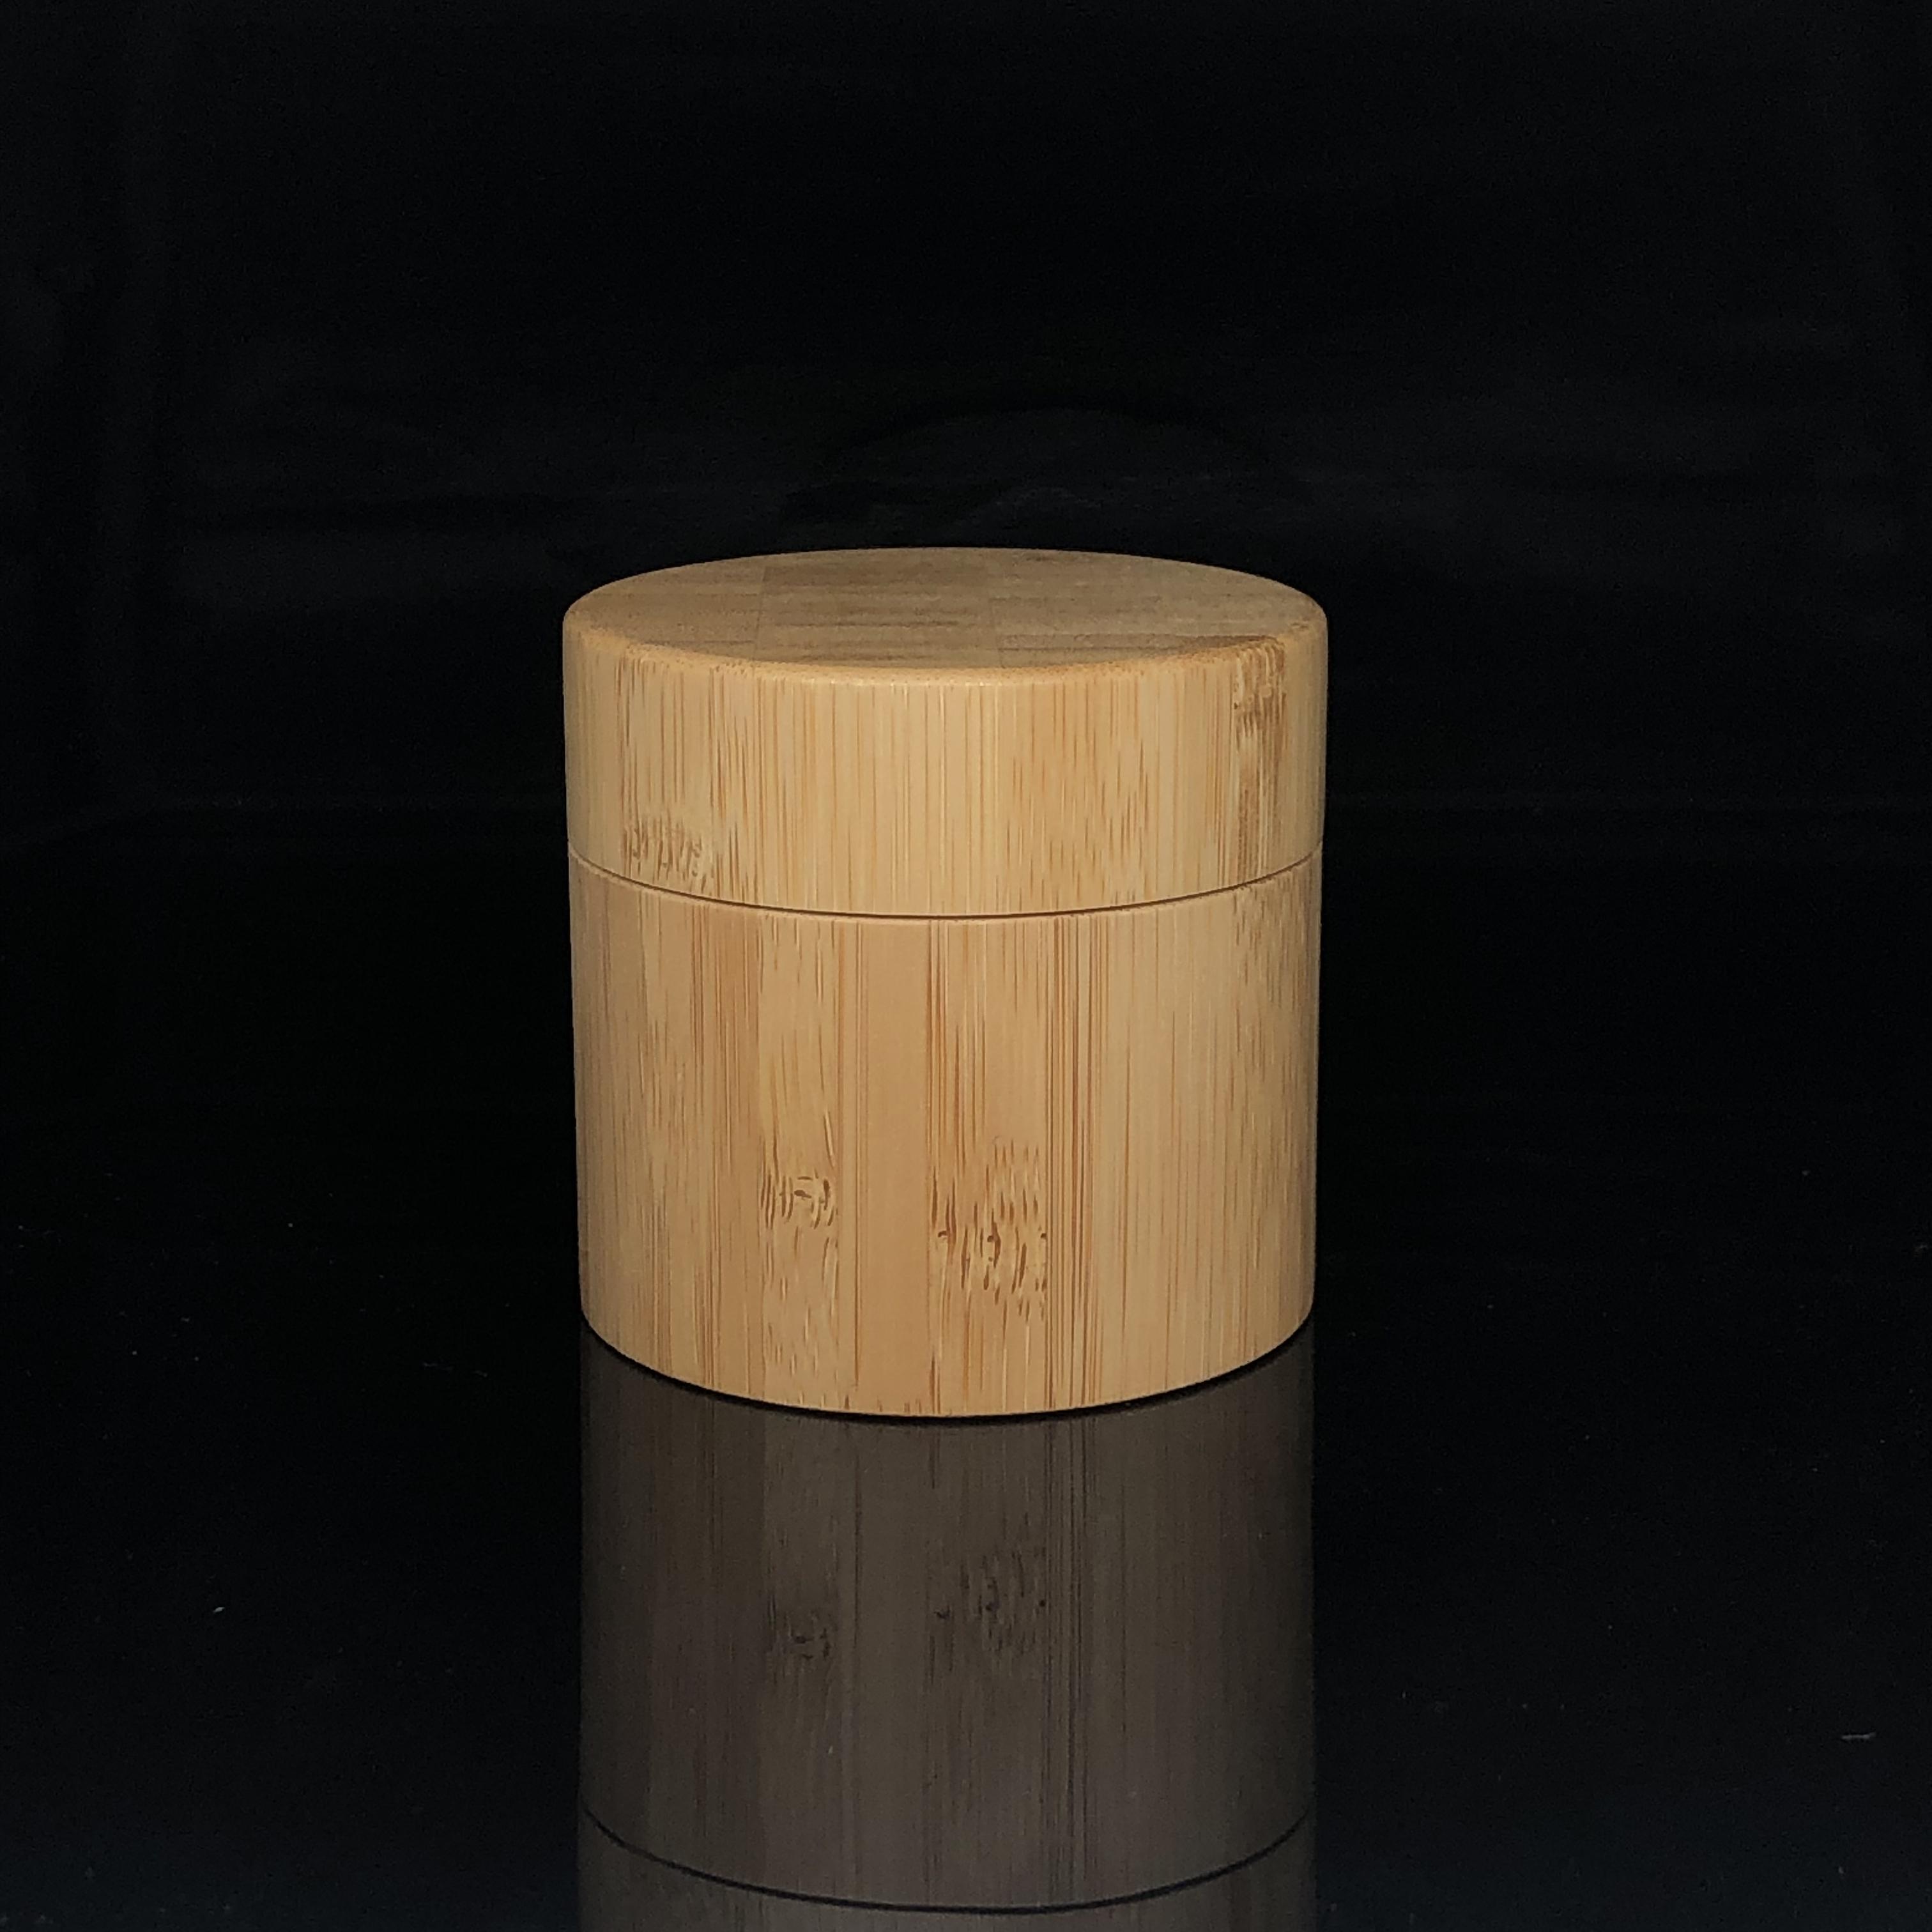 30G Biodegratable Lotion Verpackung Holz Abdeckung PP Inneren Lip Balm Auge Creme Behälter Bambus Kunststoff Jar